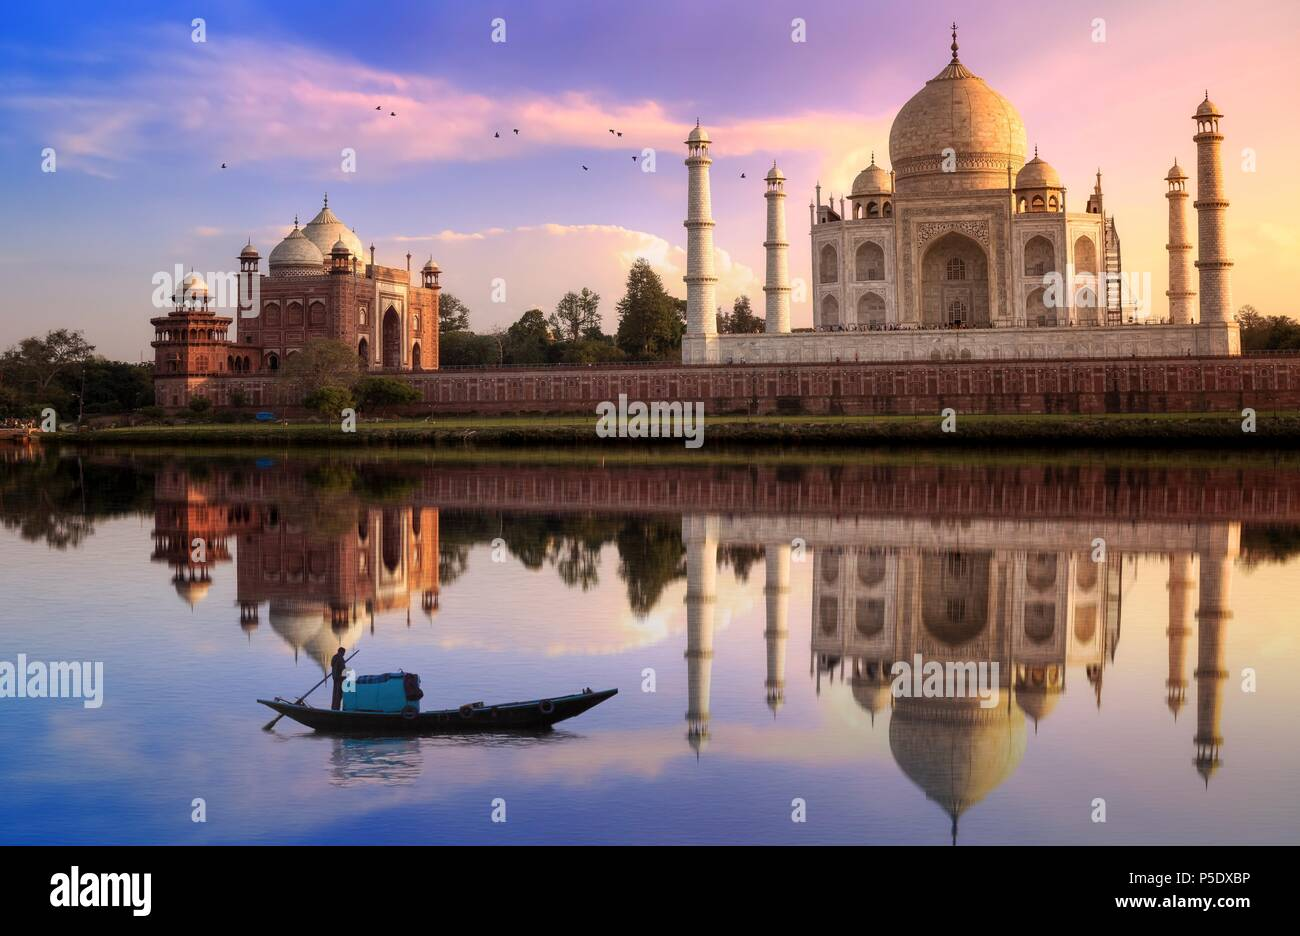 Taj Mahal Agra bei Sonnenuntergang mit Moody Himmel mit Holz- Boot auf dem Fluss Yamuna Stockbild